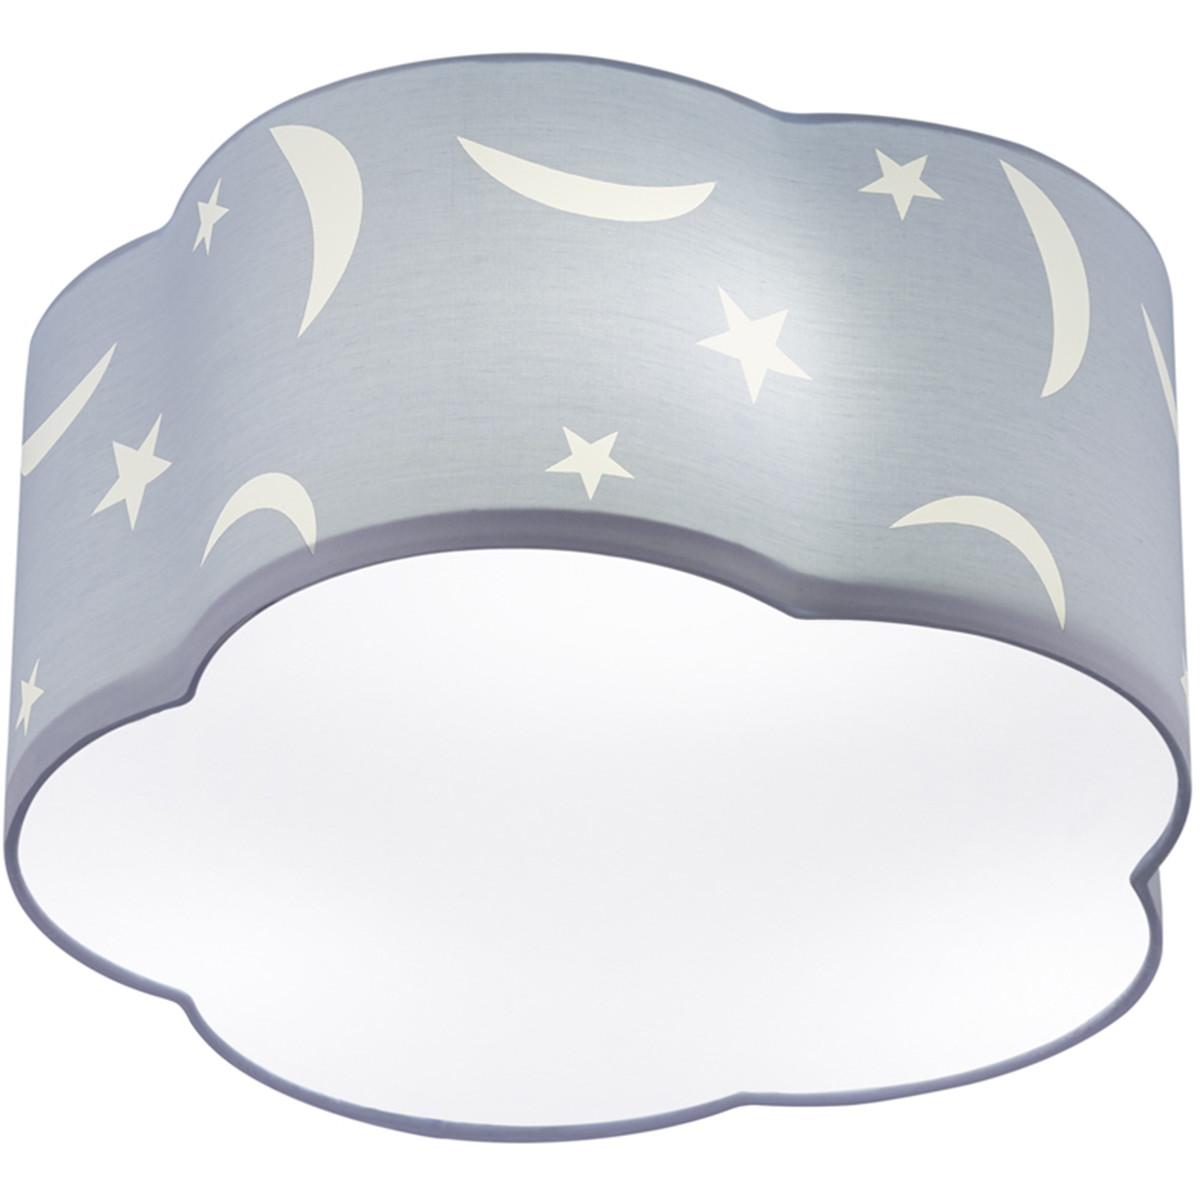 LED Plafondlamp - Plafondverlichting - Trion Monimo - E27 Fitting - 3-lichts - Rond - Mat Blauw - Al